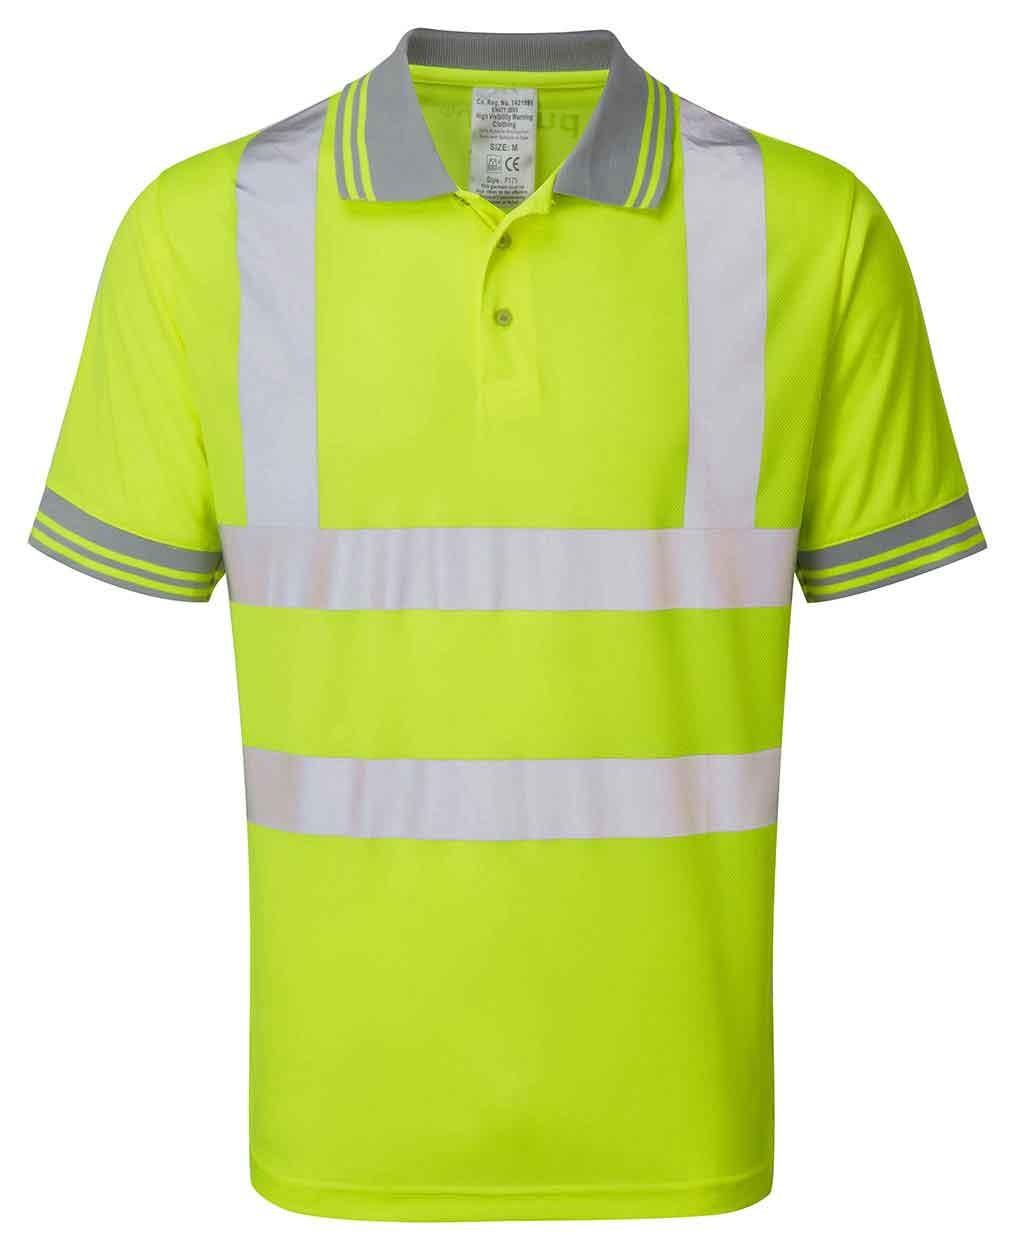 New Size XL PULSAR P175 Yellow Hi Vis 100/% Polyester Polo Shirt UV Protection